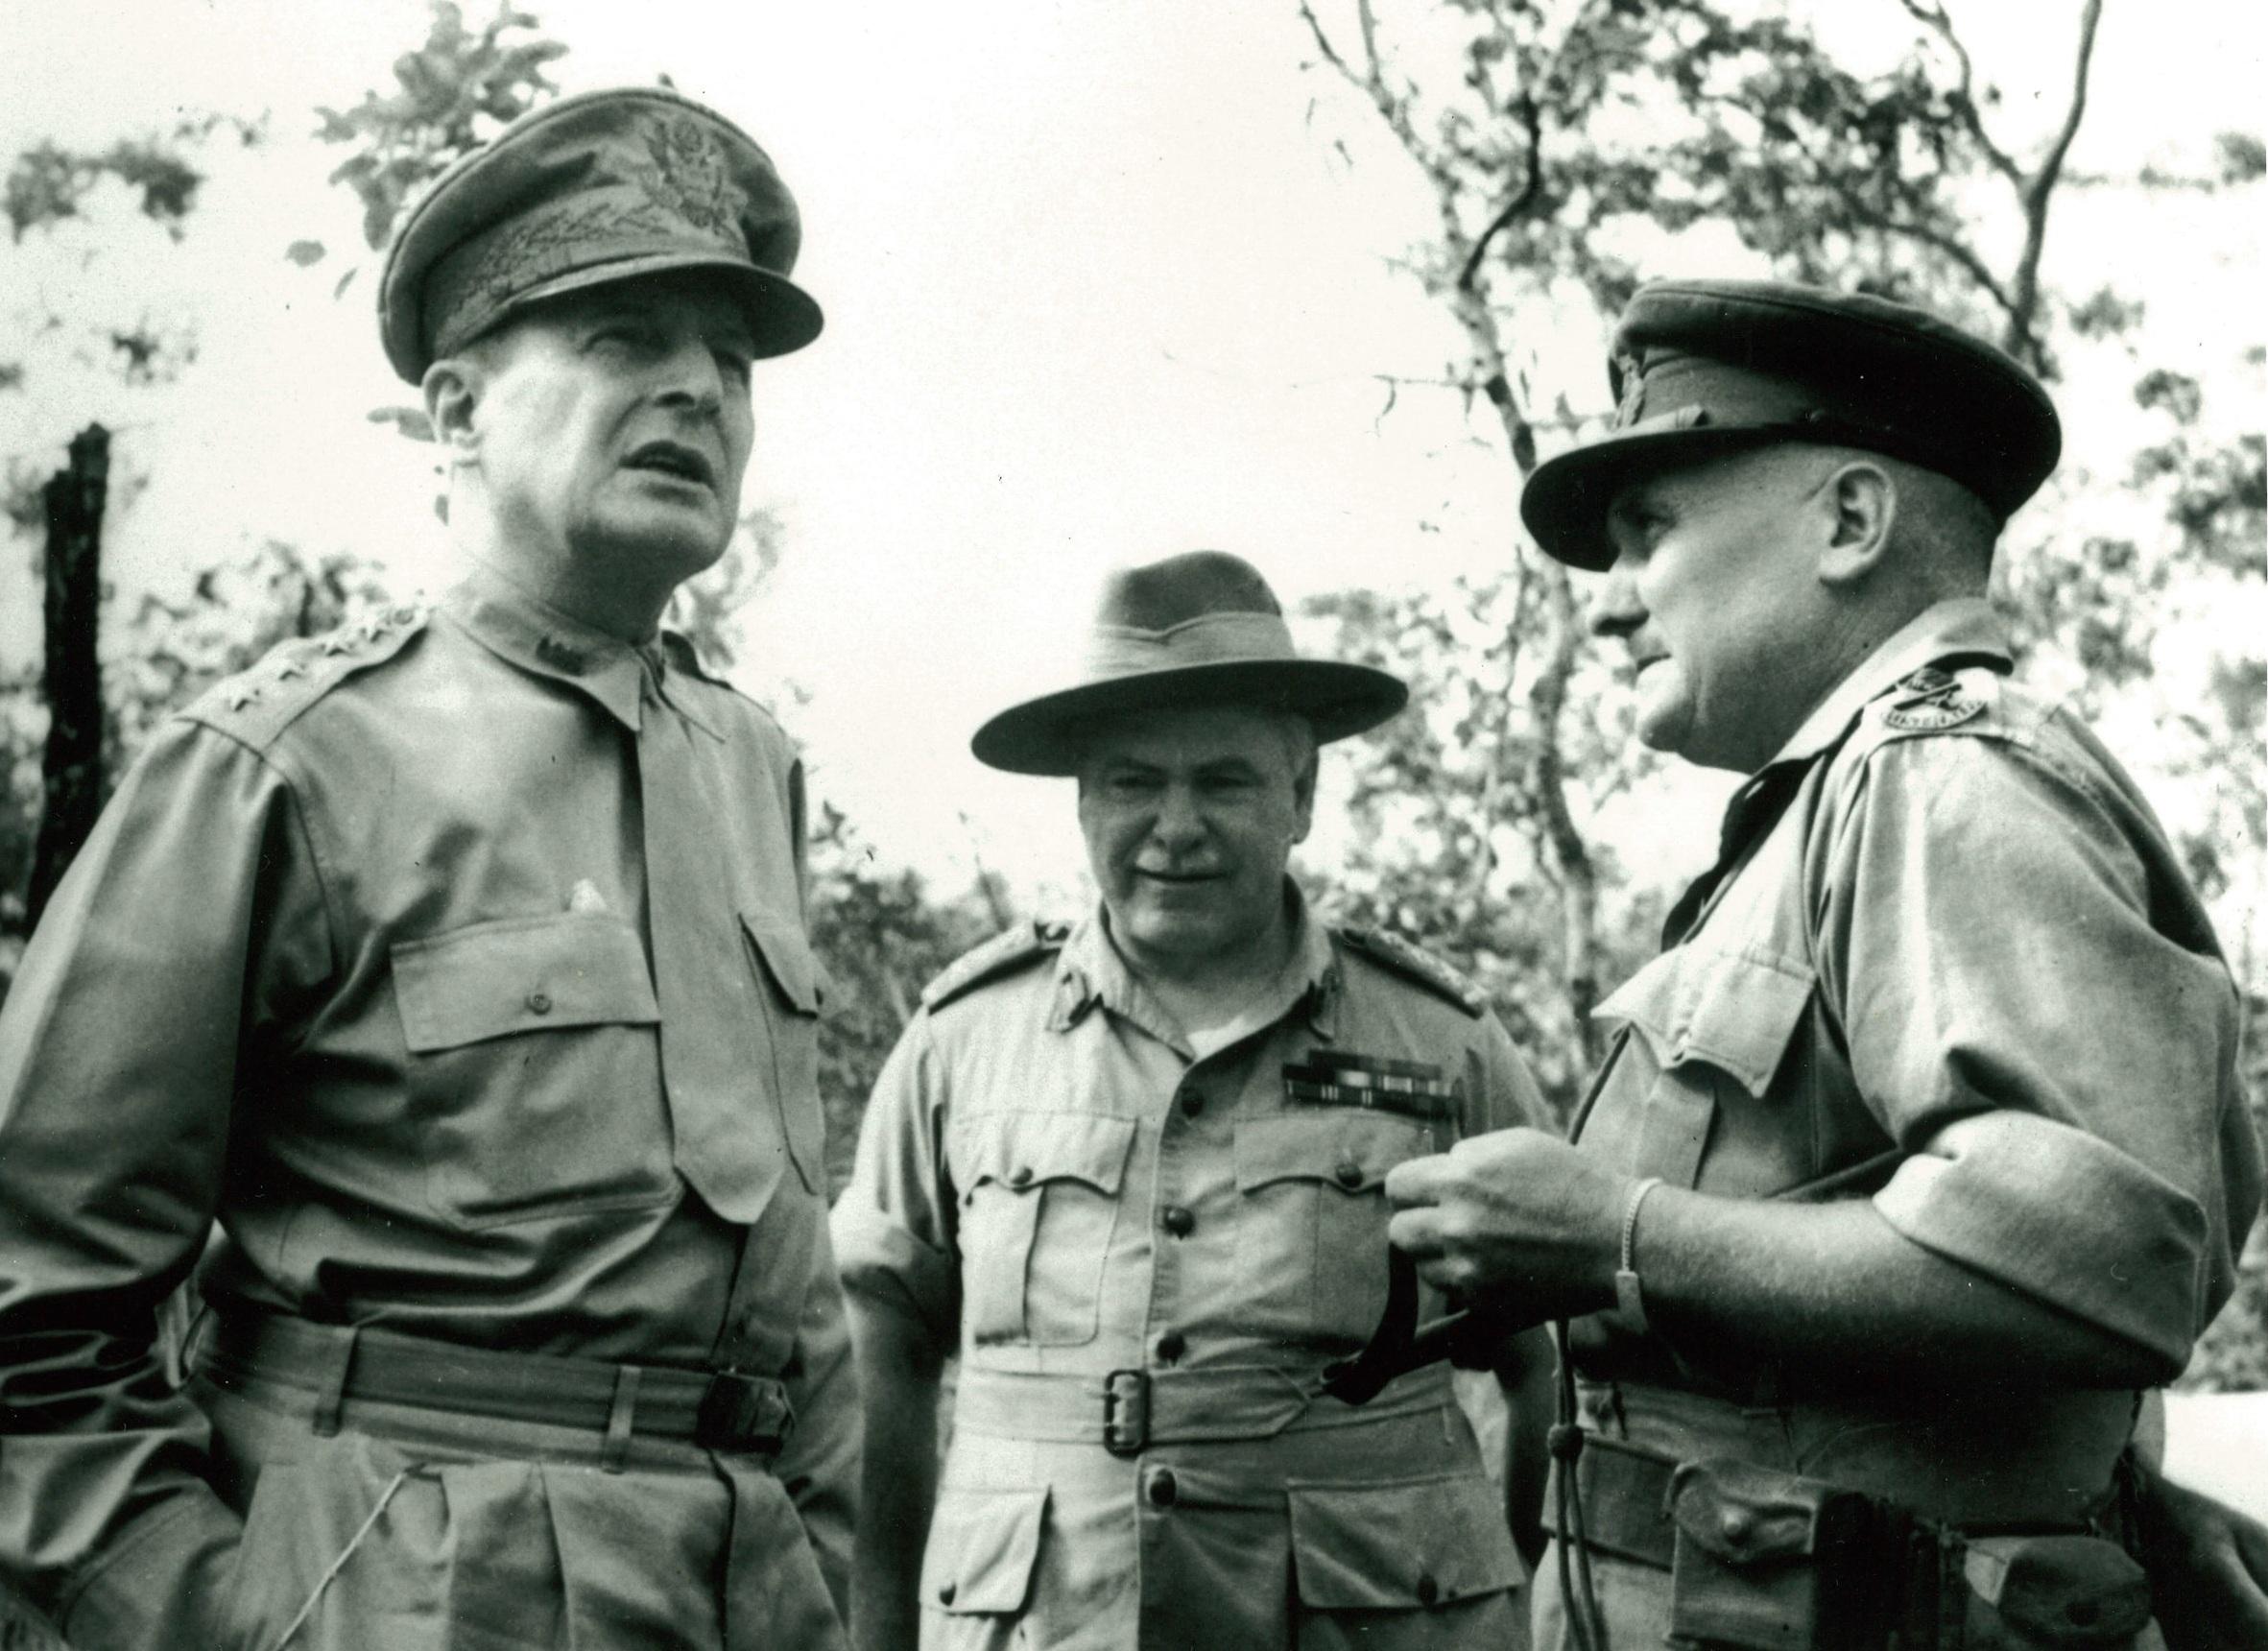 Maj-Gen Arthur 'Tubby' Allen during WWII.